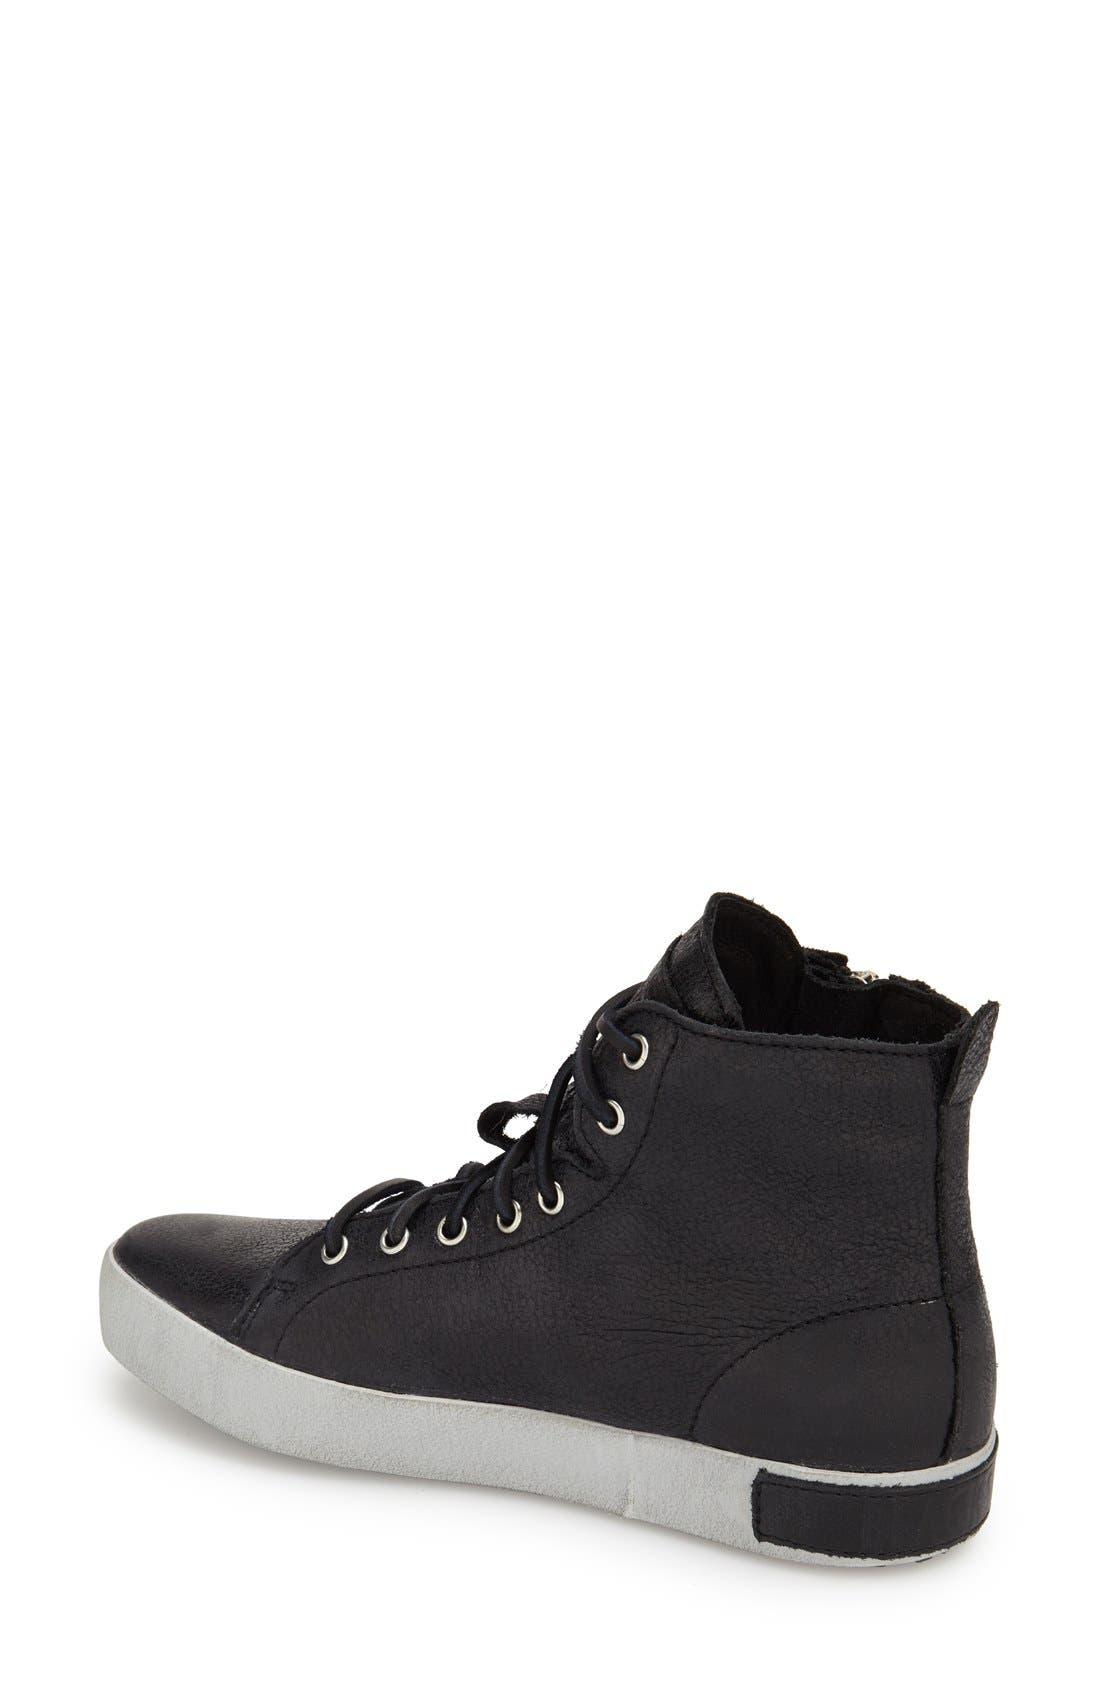 'KL57' High Top Sneaker,                             Alternate thumbnail 2, color,                             Caviar Black Leather